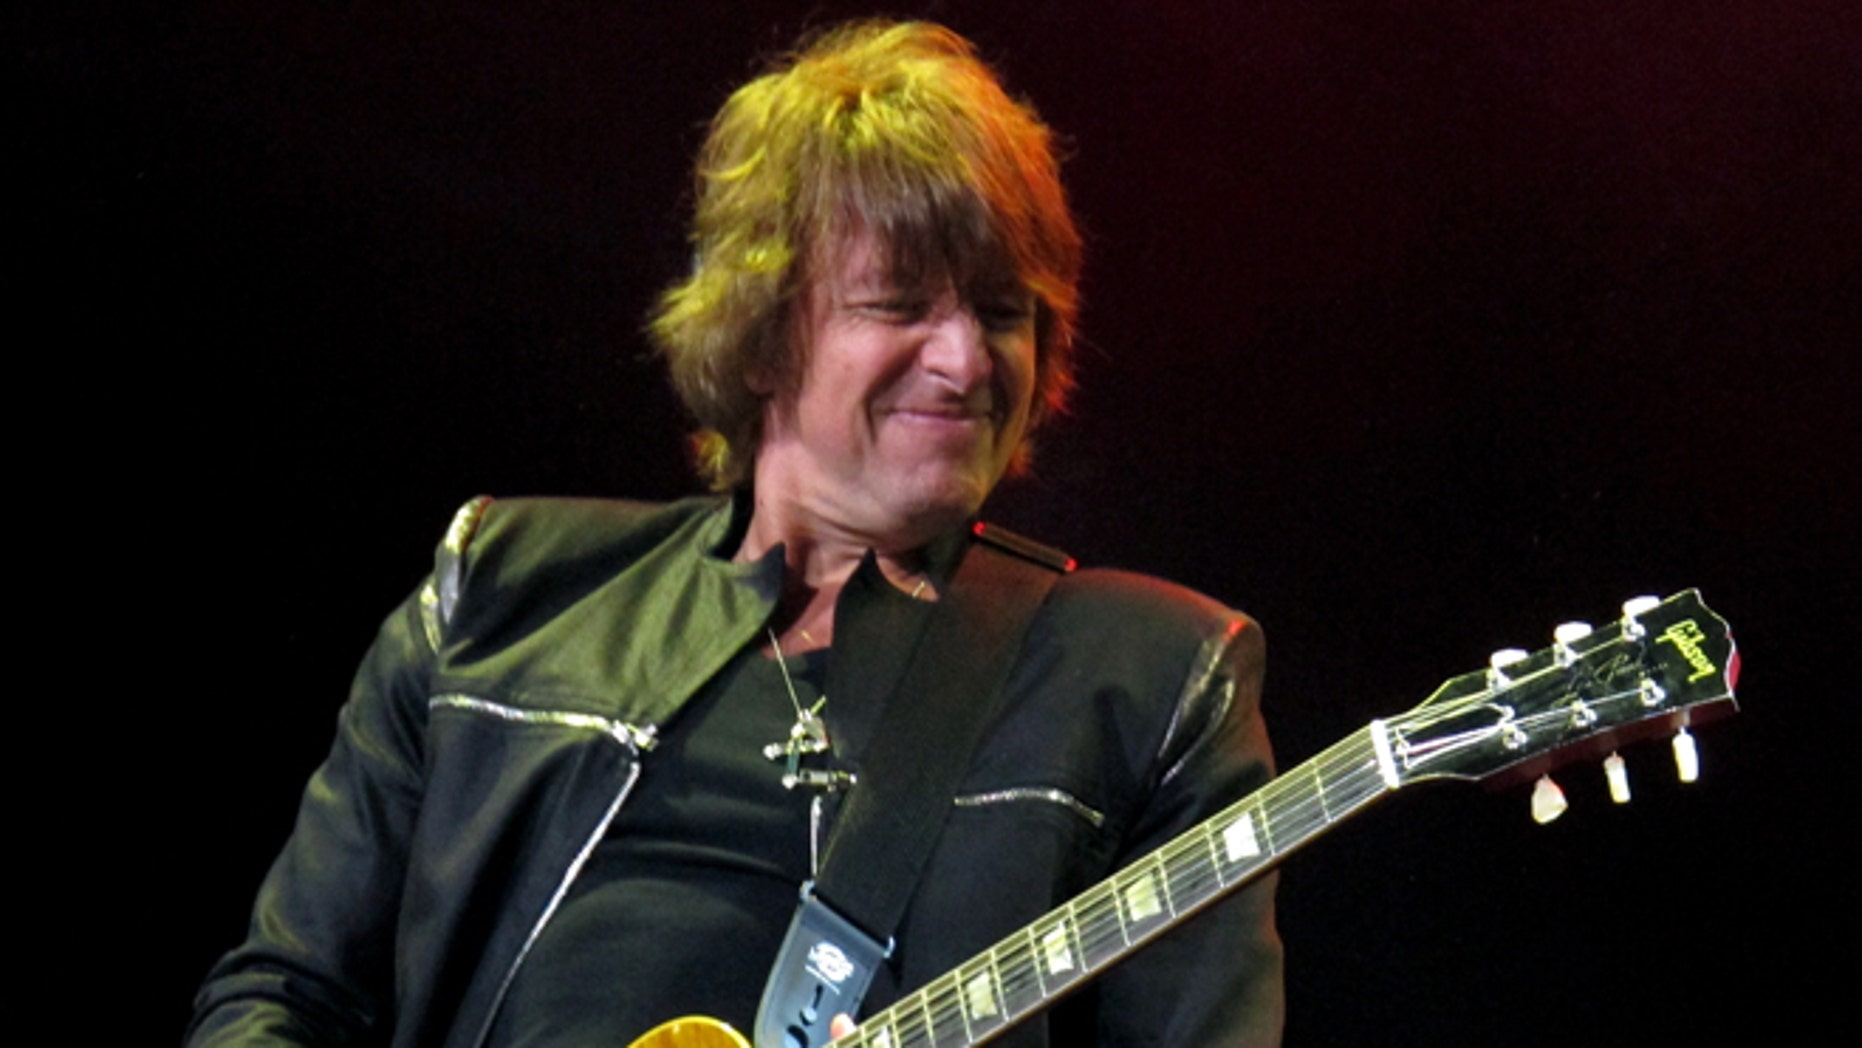 May 20, 2012: This file photo shows Bon Jovi guitarist Richie Sambora performing at the Bamboozle Festival in Asbury Park N.J.